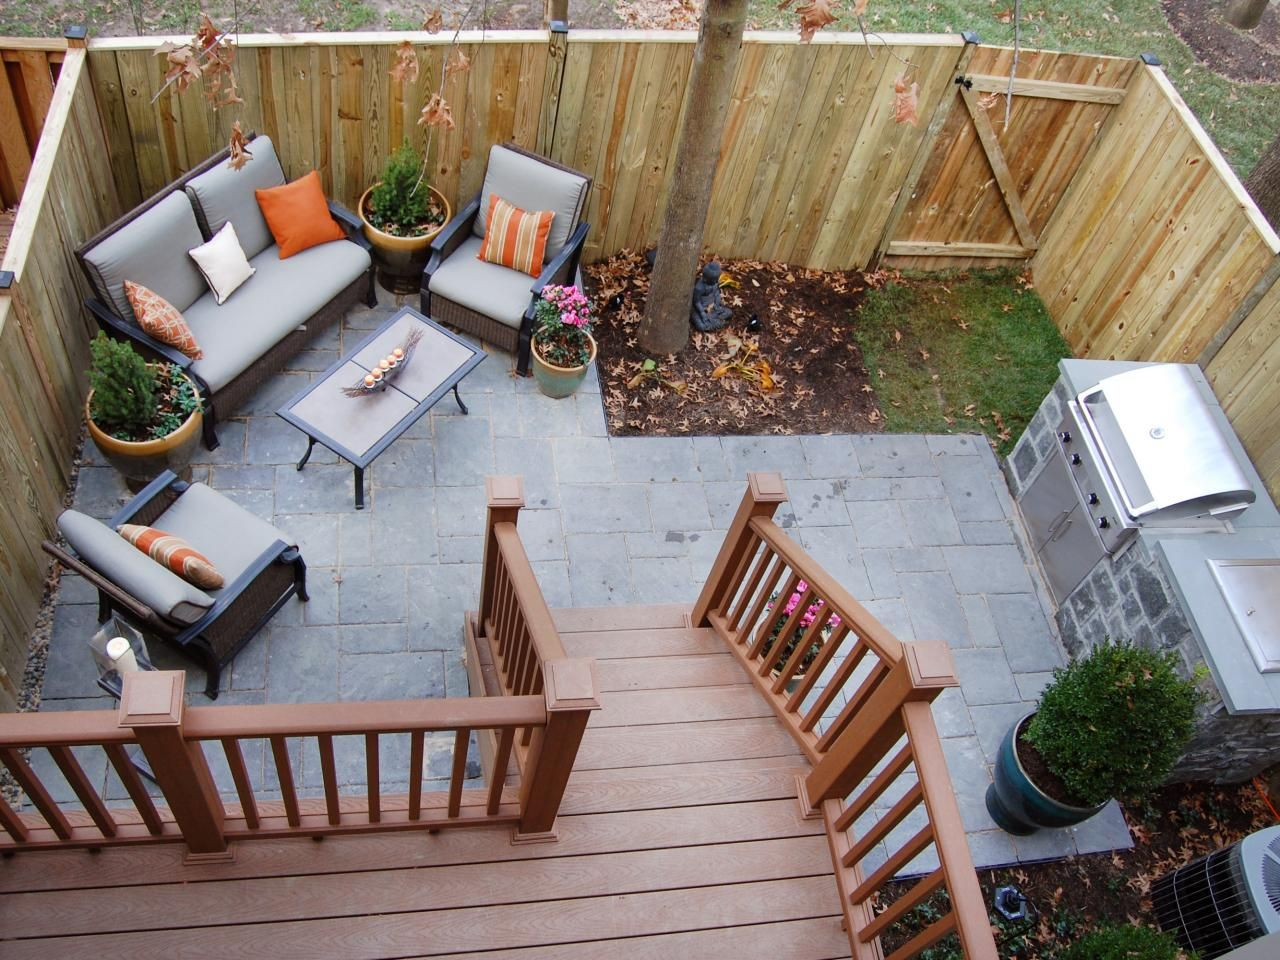 Outdoor Kitchen Cabinet Ideas: Pictures, Tips & Expert Advice | Outdoor Design - Landscaping Ideas, Porches, Decks, & Patios | HGTV